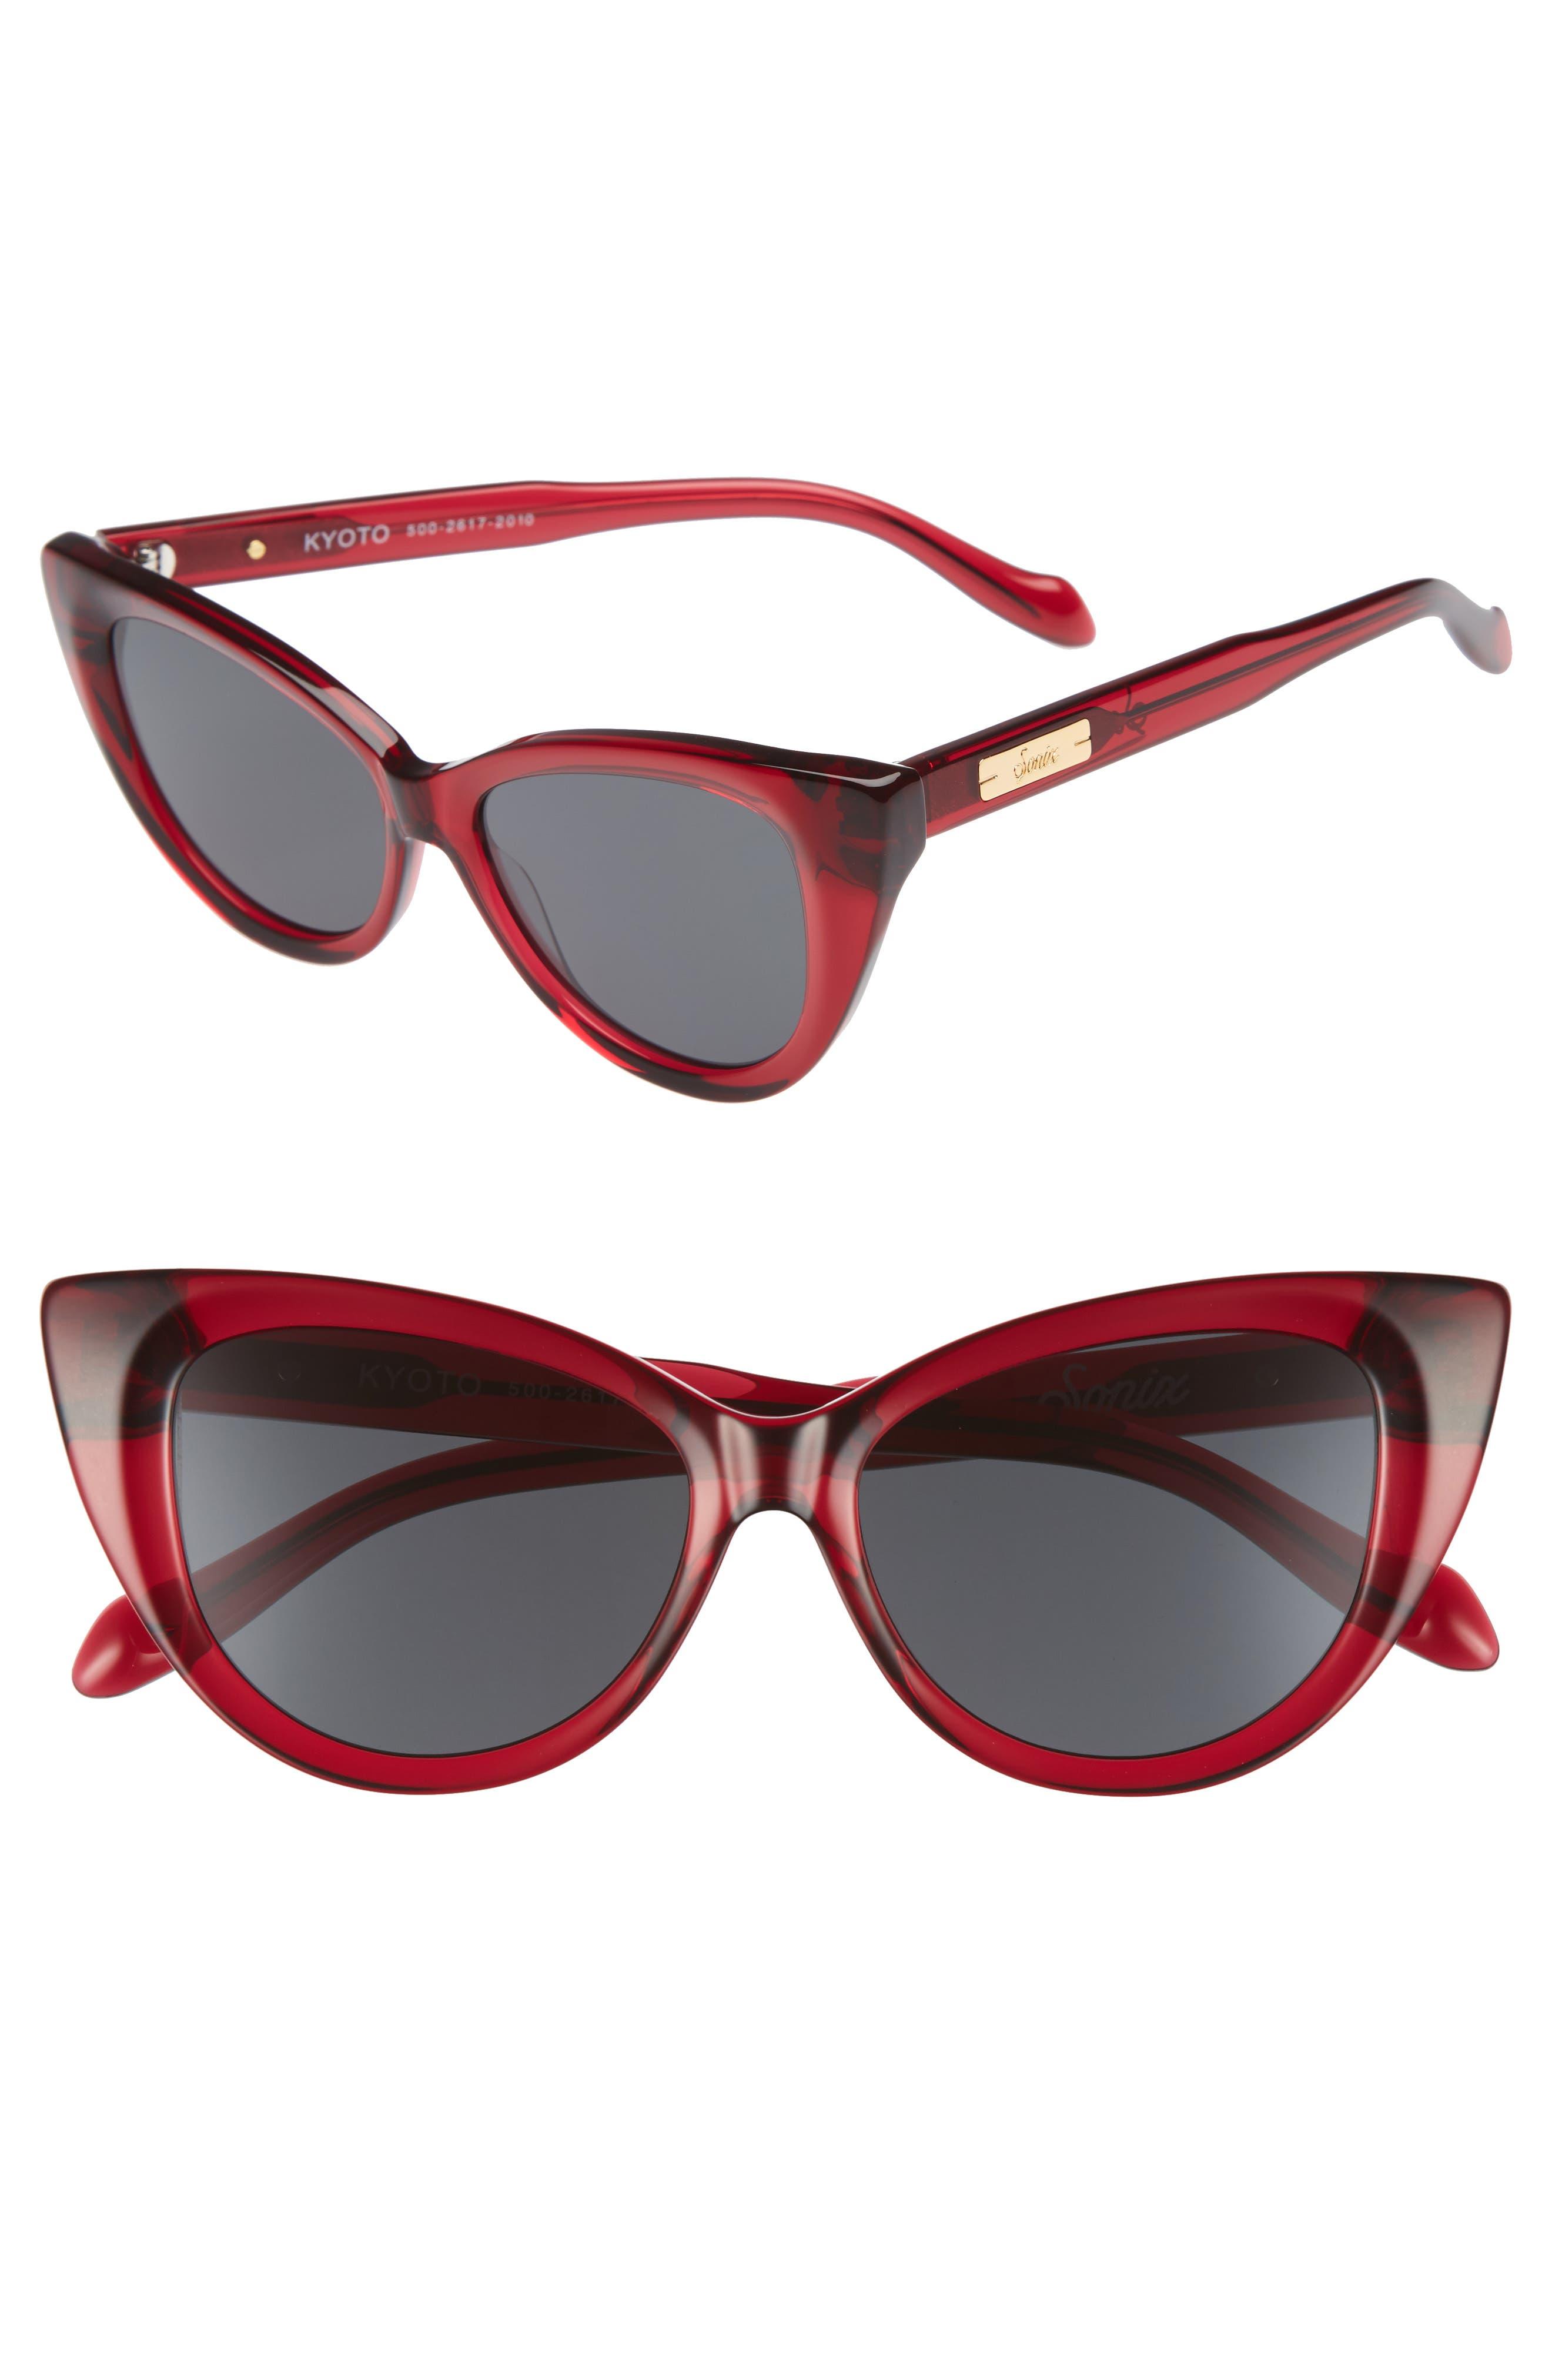 Kyoto 51mm Cat Eye Sunglasses,                             Main thumbnail 5, color,